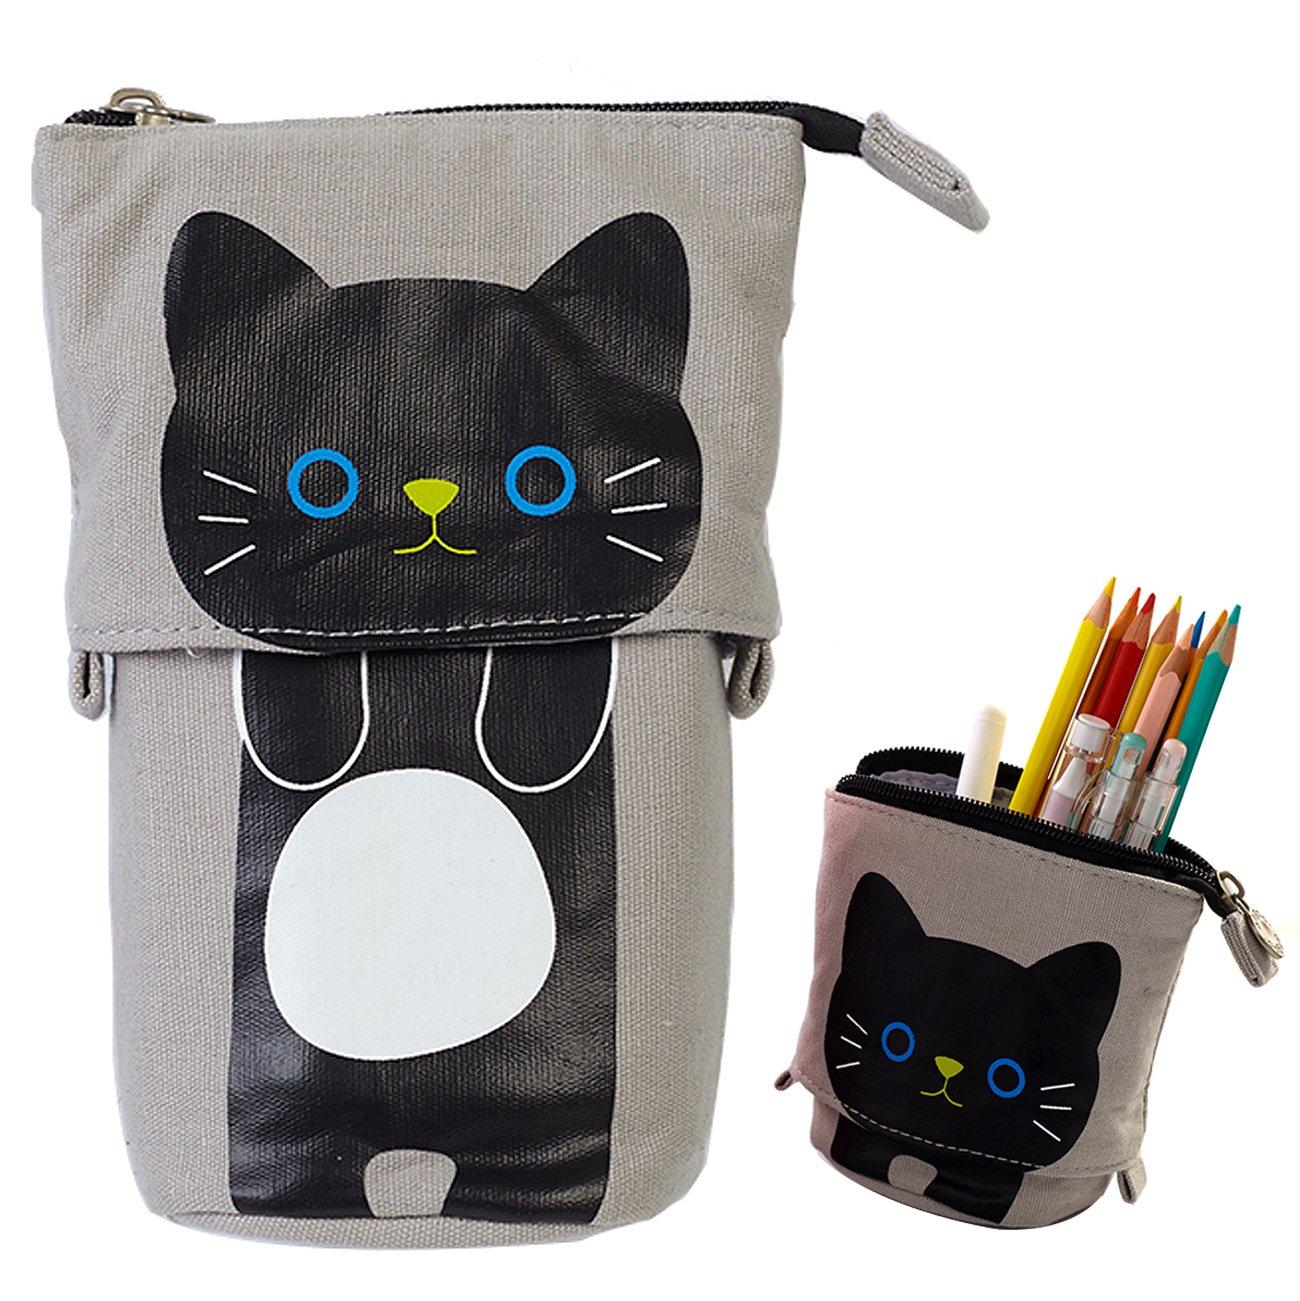 iSuperb Transformer Stand Store Pencil Holder Canvas+PU Cartoon Cute Cat Telescopic Pencil Pouch Bag Stationery Pen Case Box with Zipper Closure 7.5 x 4.9 x 3.0inch/4.1x 3.0inch (Gray)